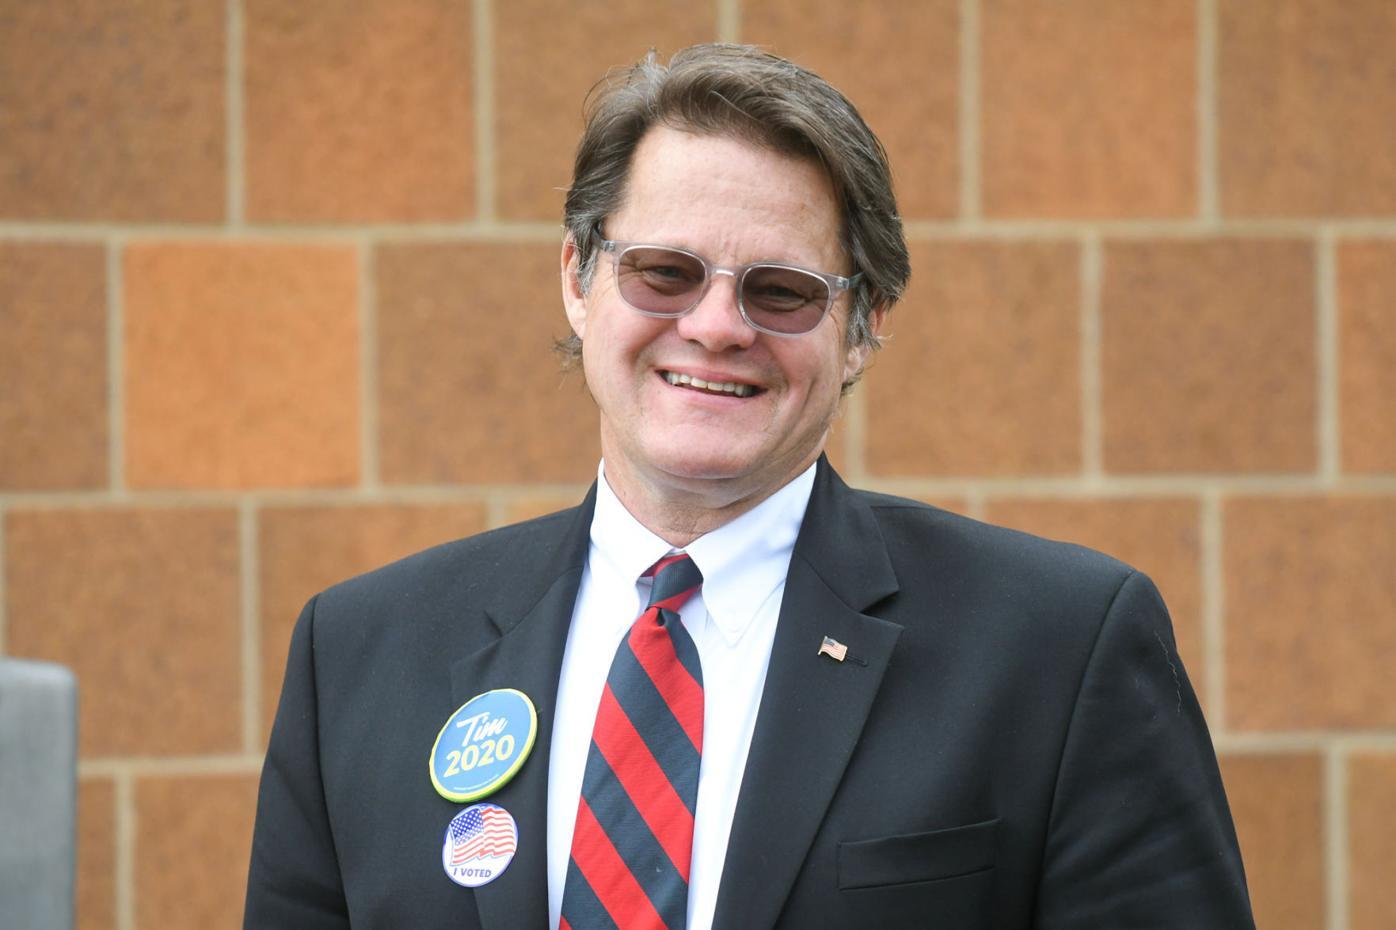 Tim Twardzik